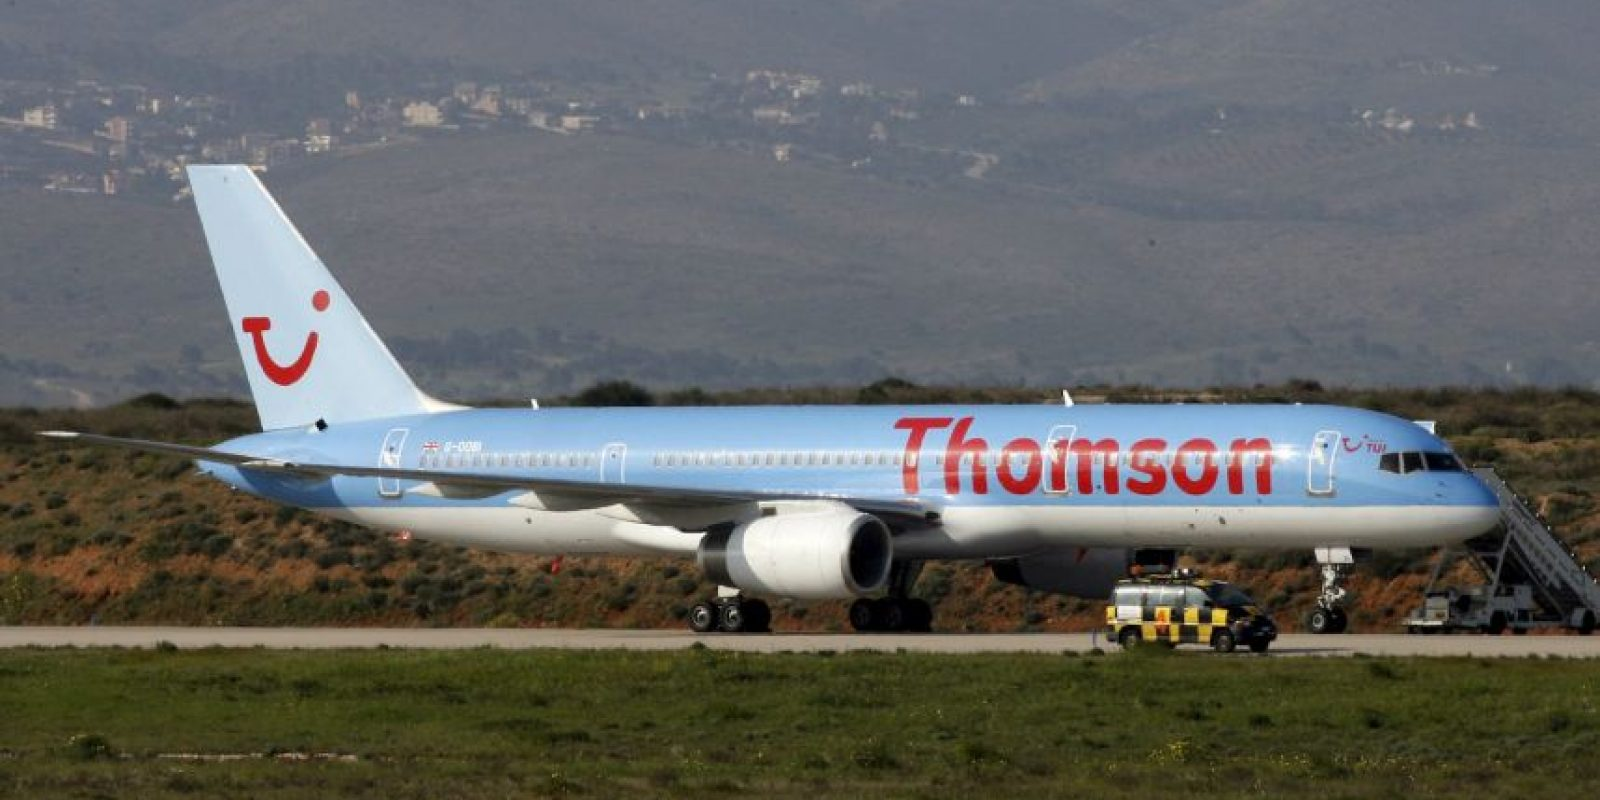 Hombre alcoholizado ocasiona que un vuelo sea desviado de su destino. Foto:Getty Images